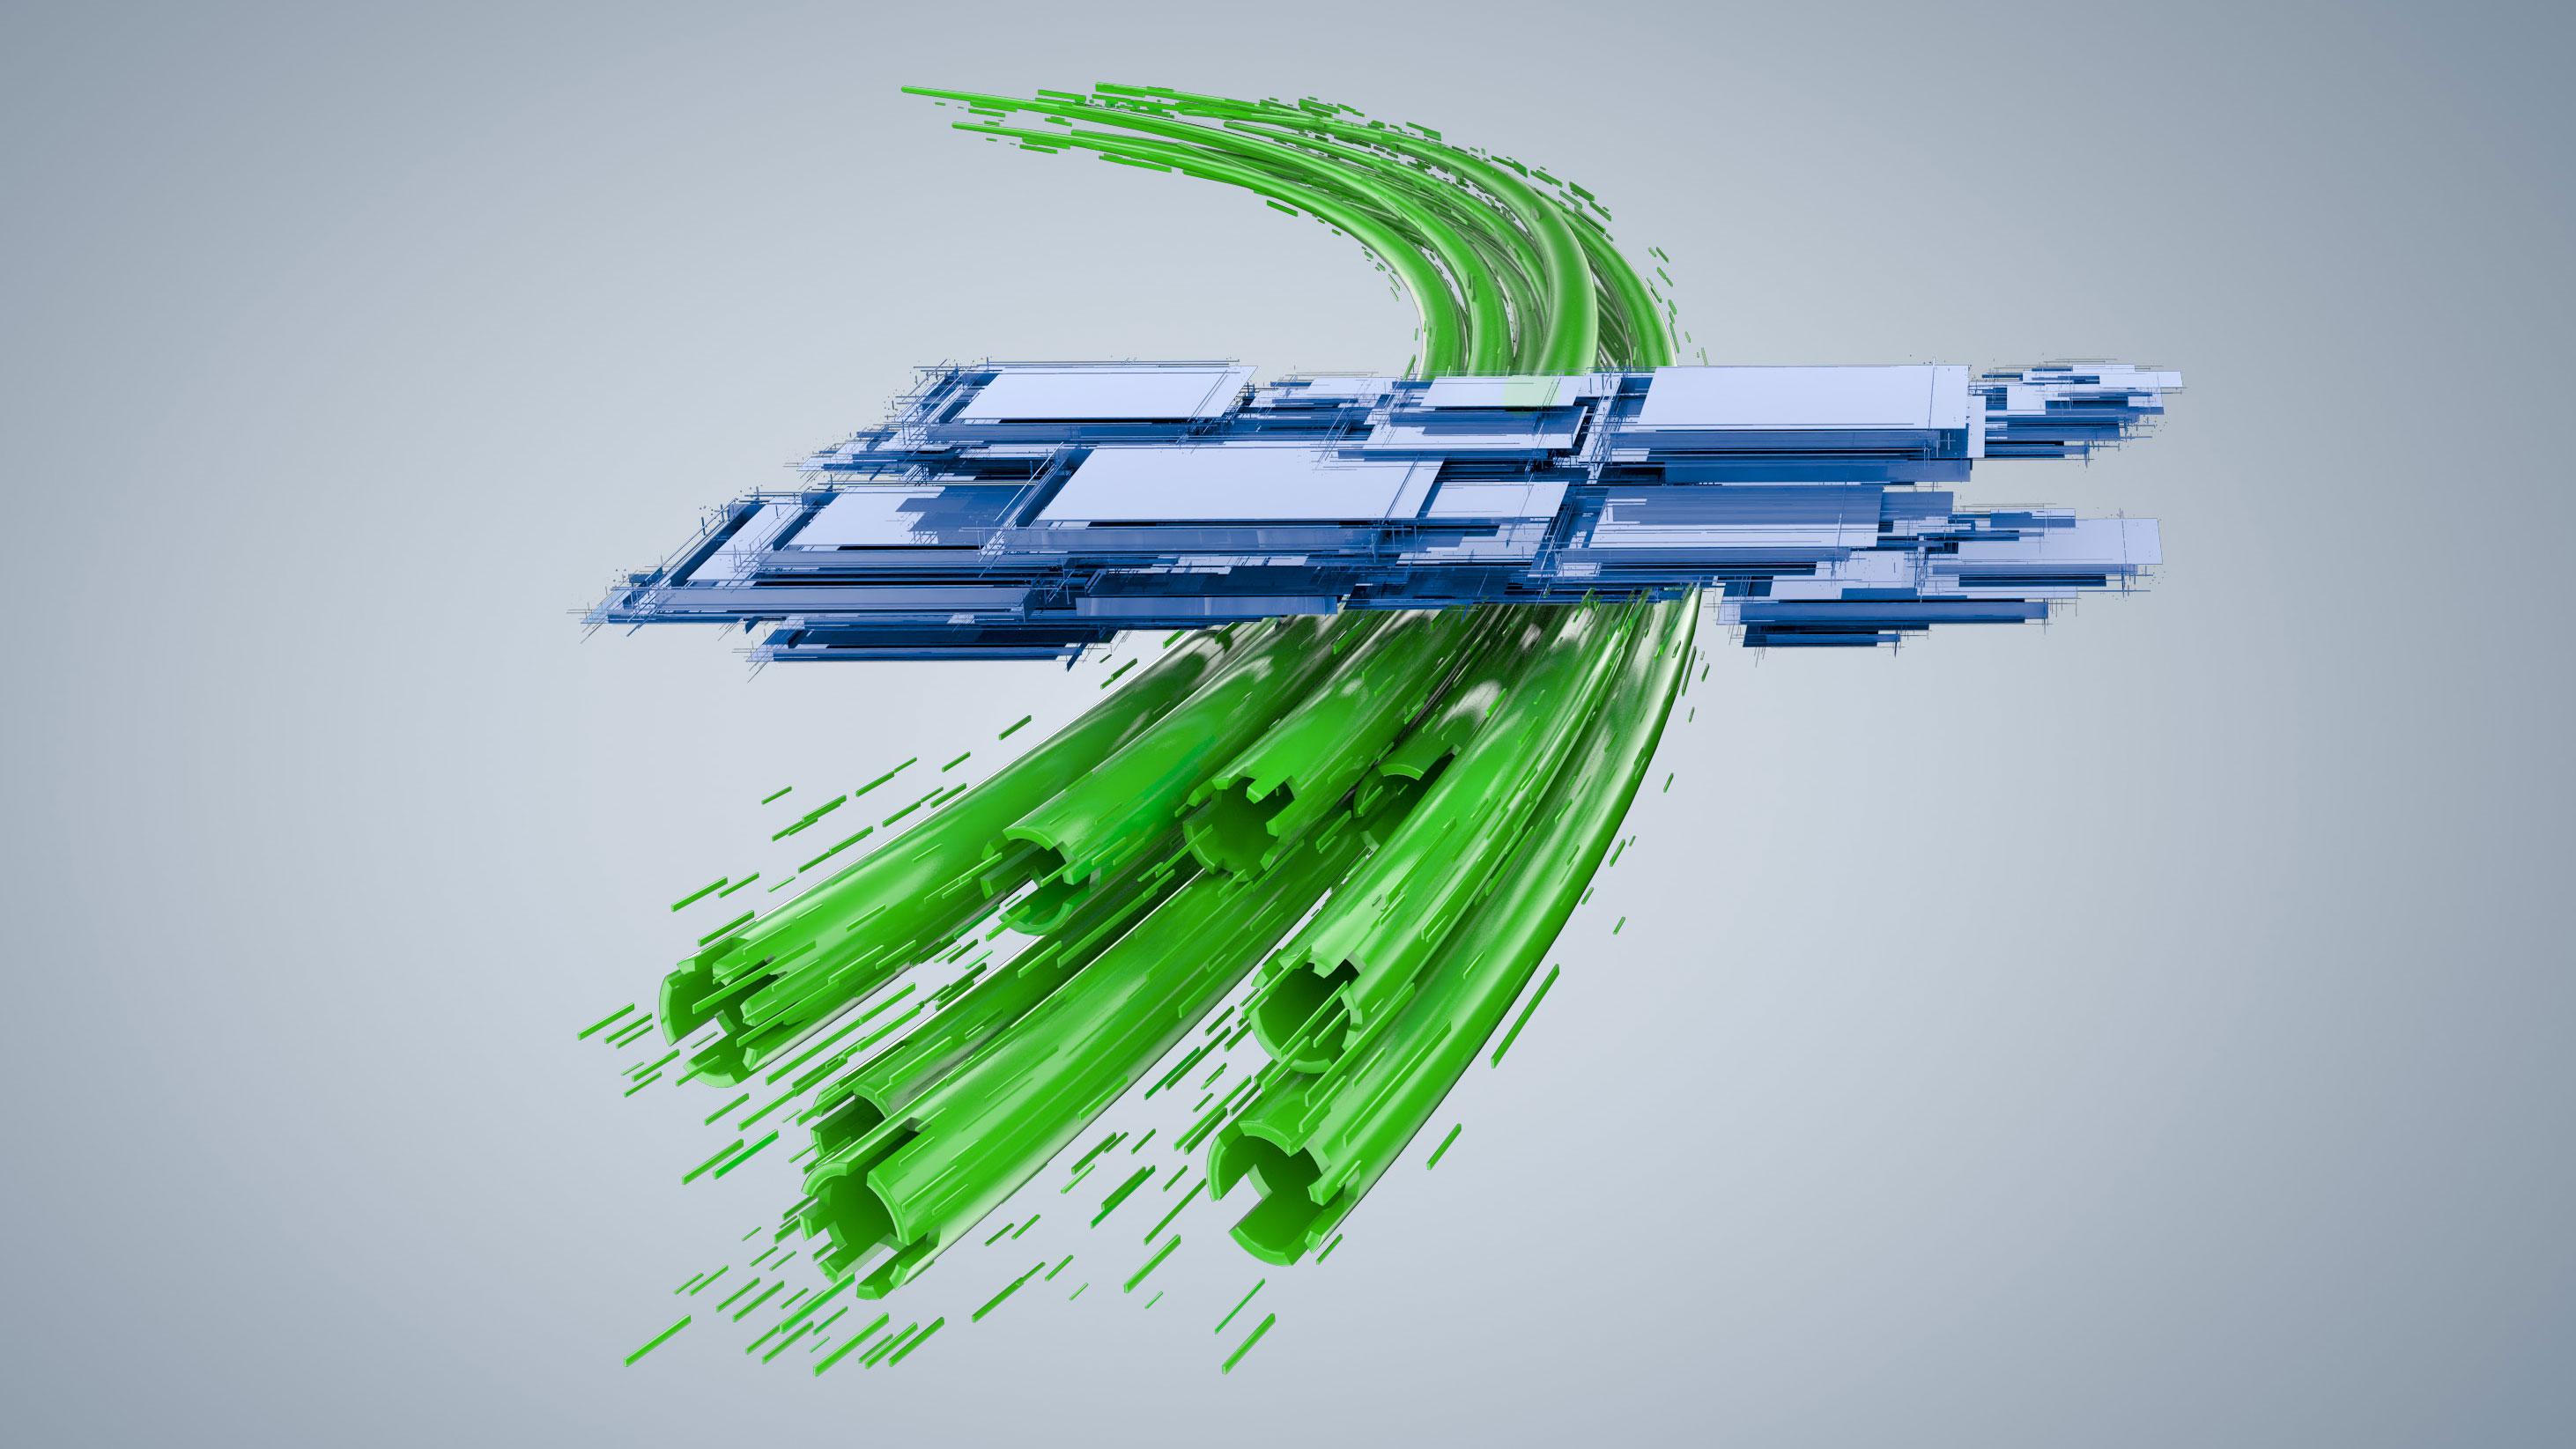 CGI Rendering 3d Innotrans Logo Messe Schienen Transformation Idris Kolodziej